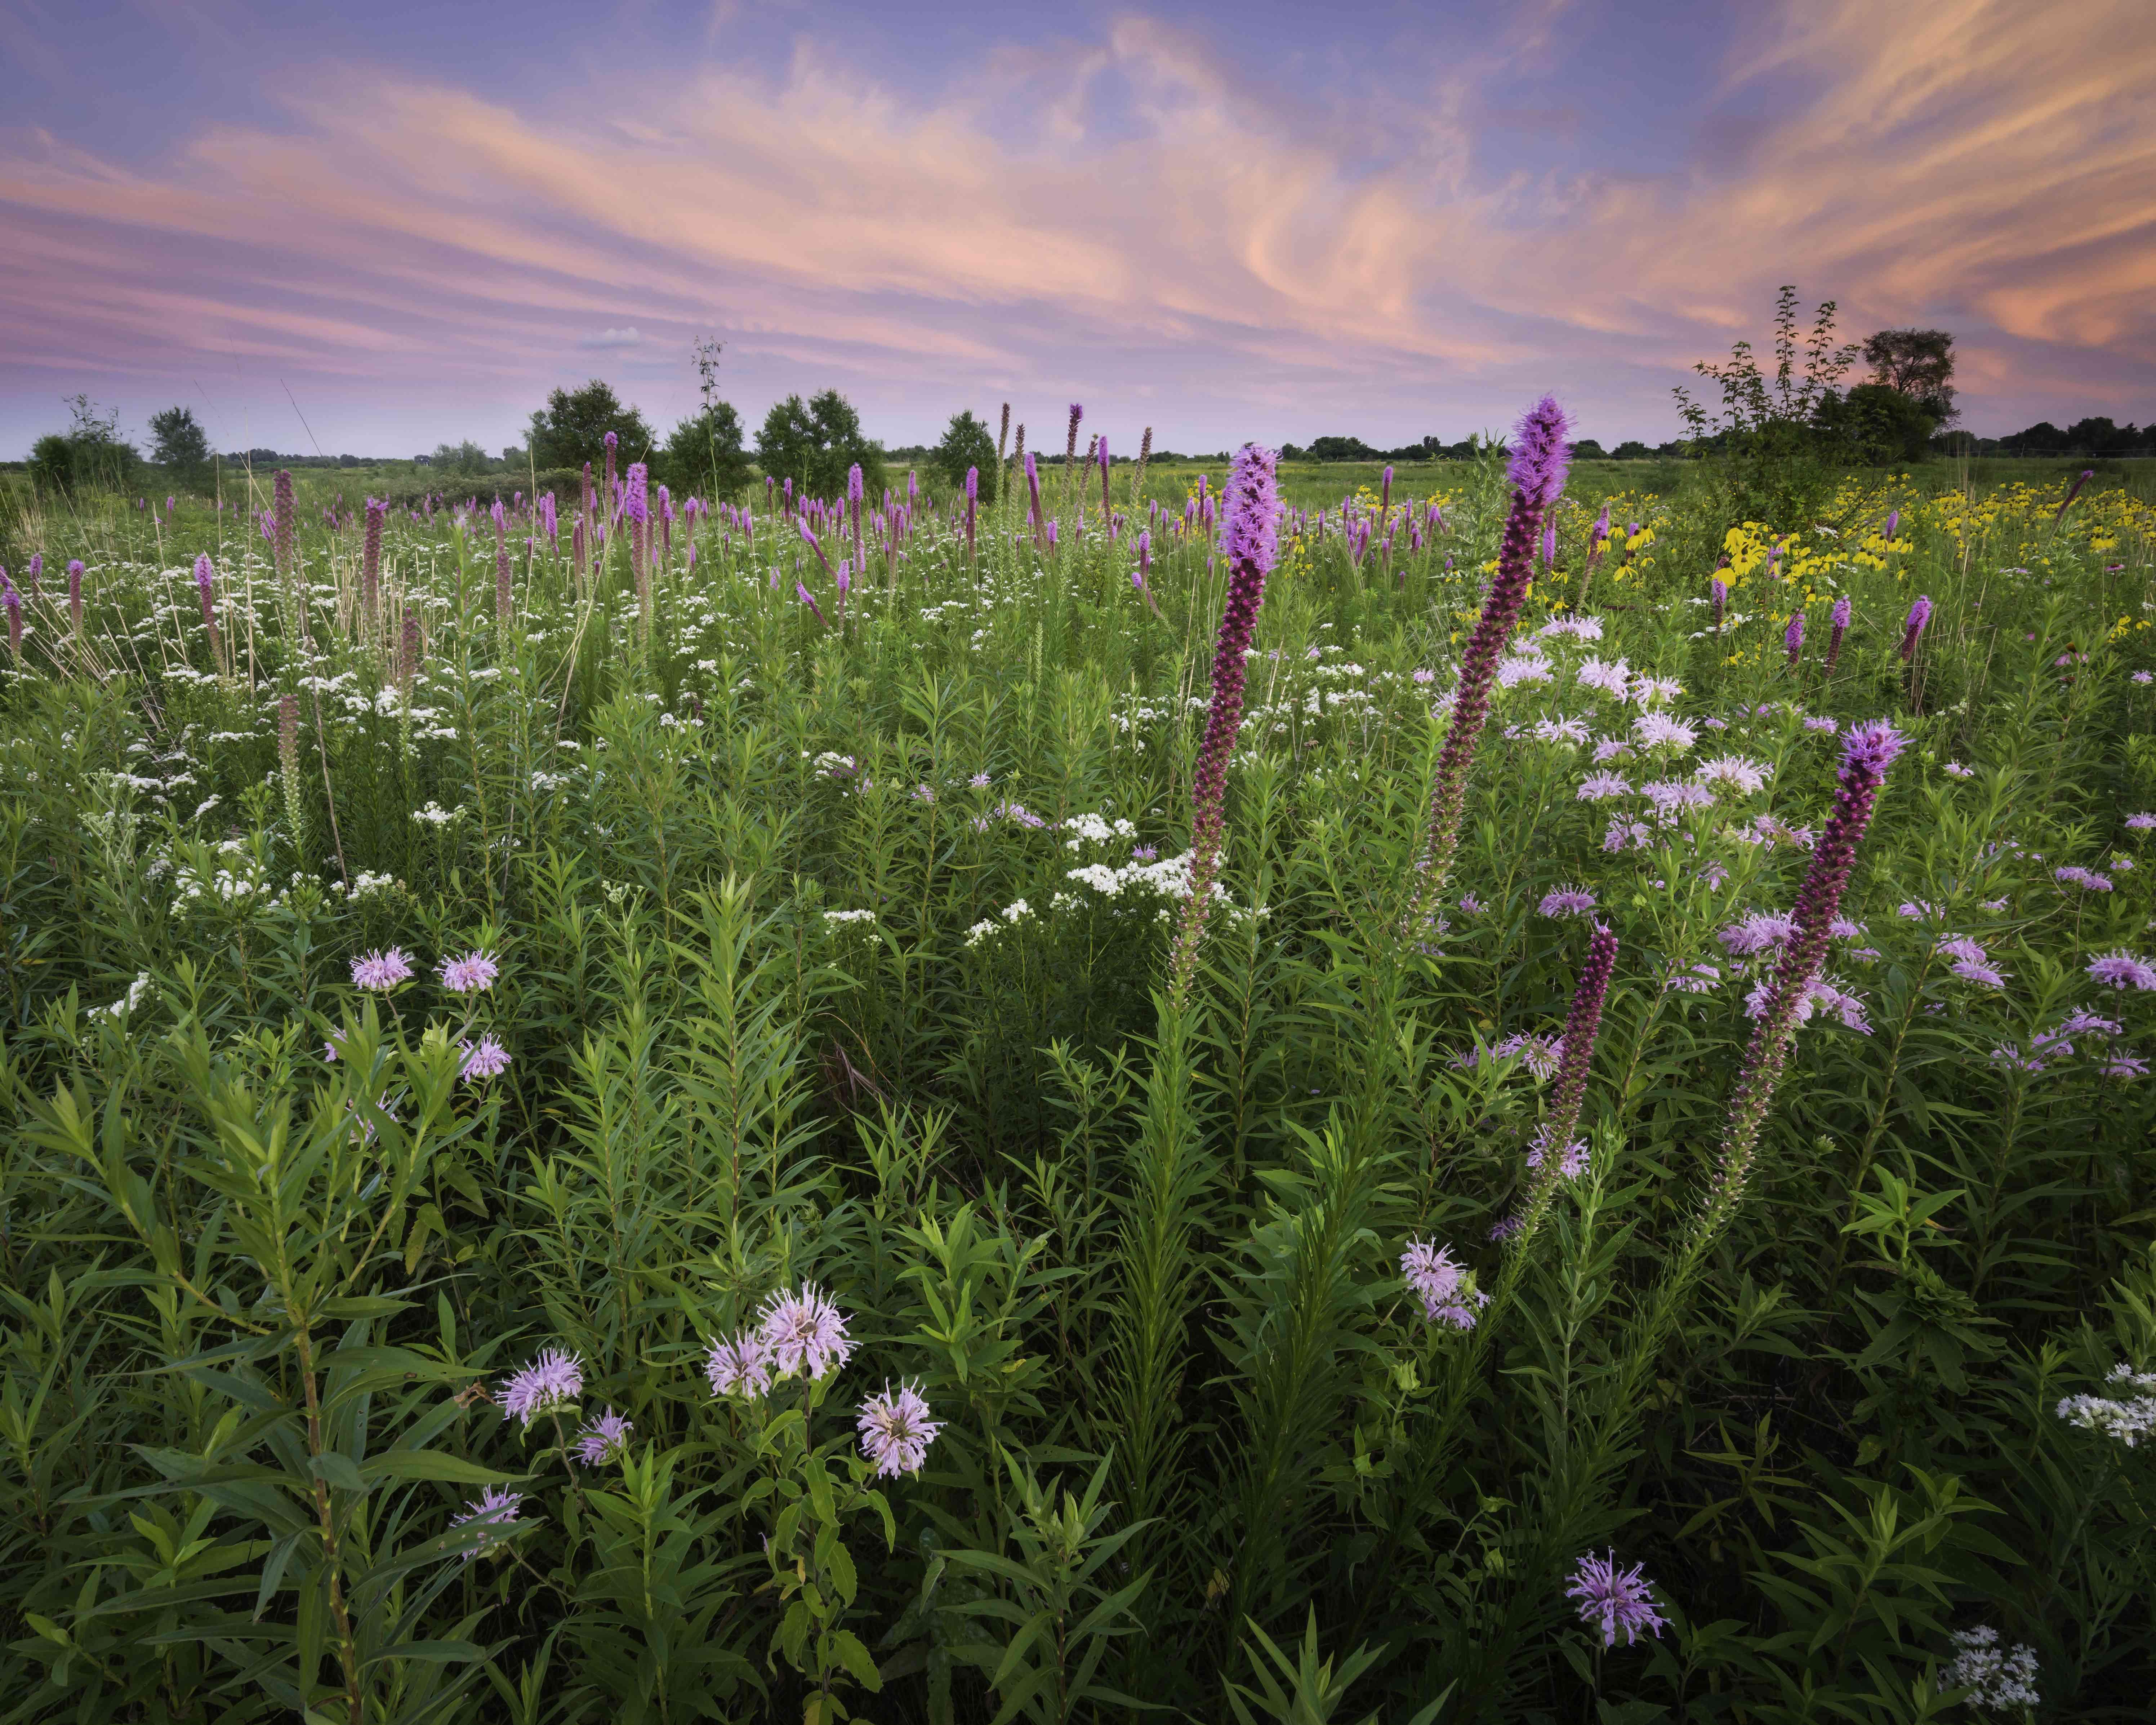 flowering meadow in Illinois